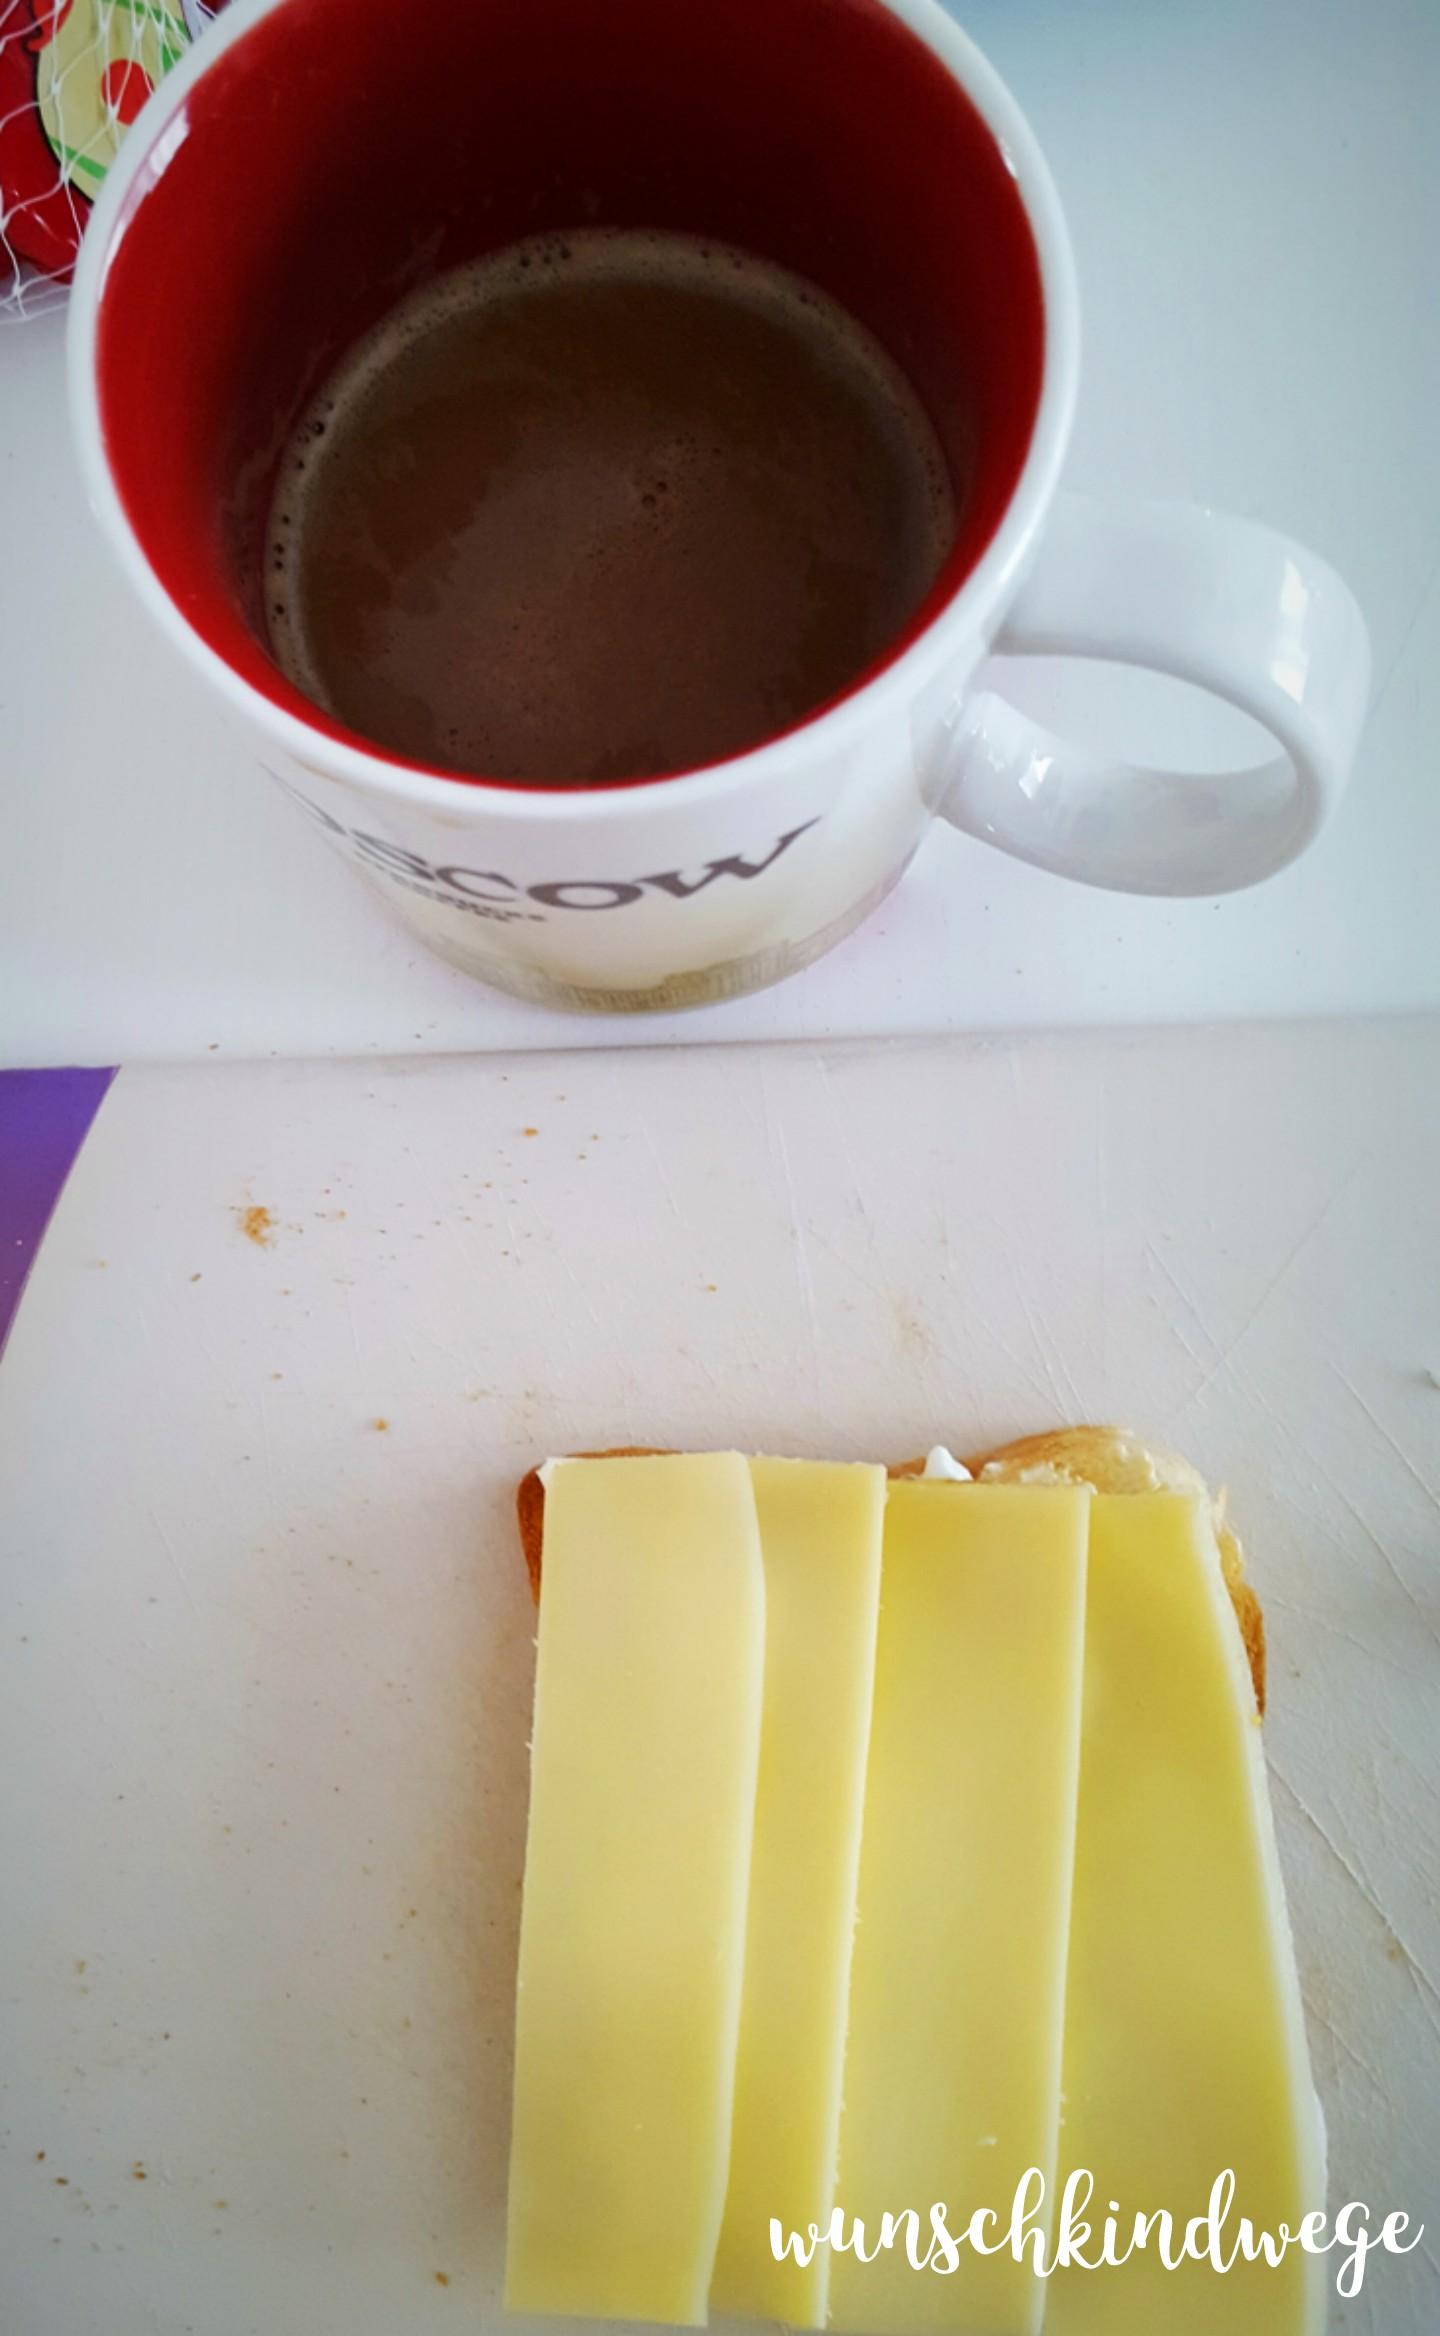 Kaffee und Käsetoast